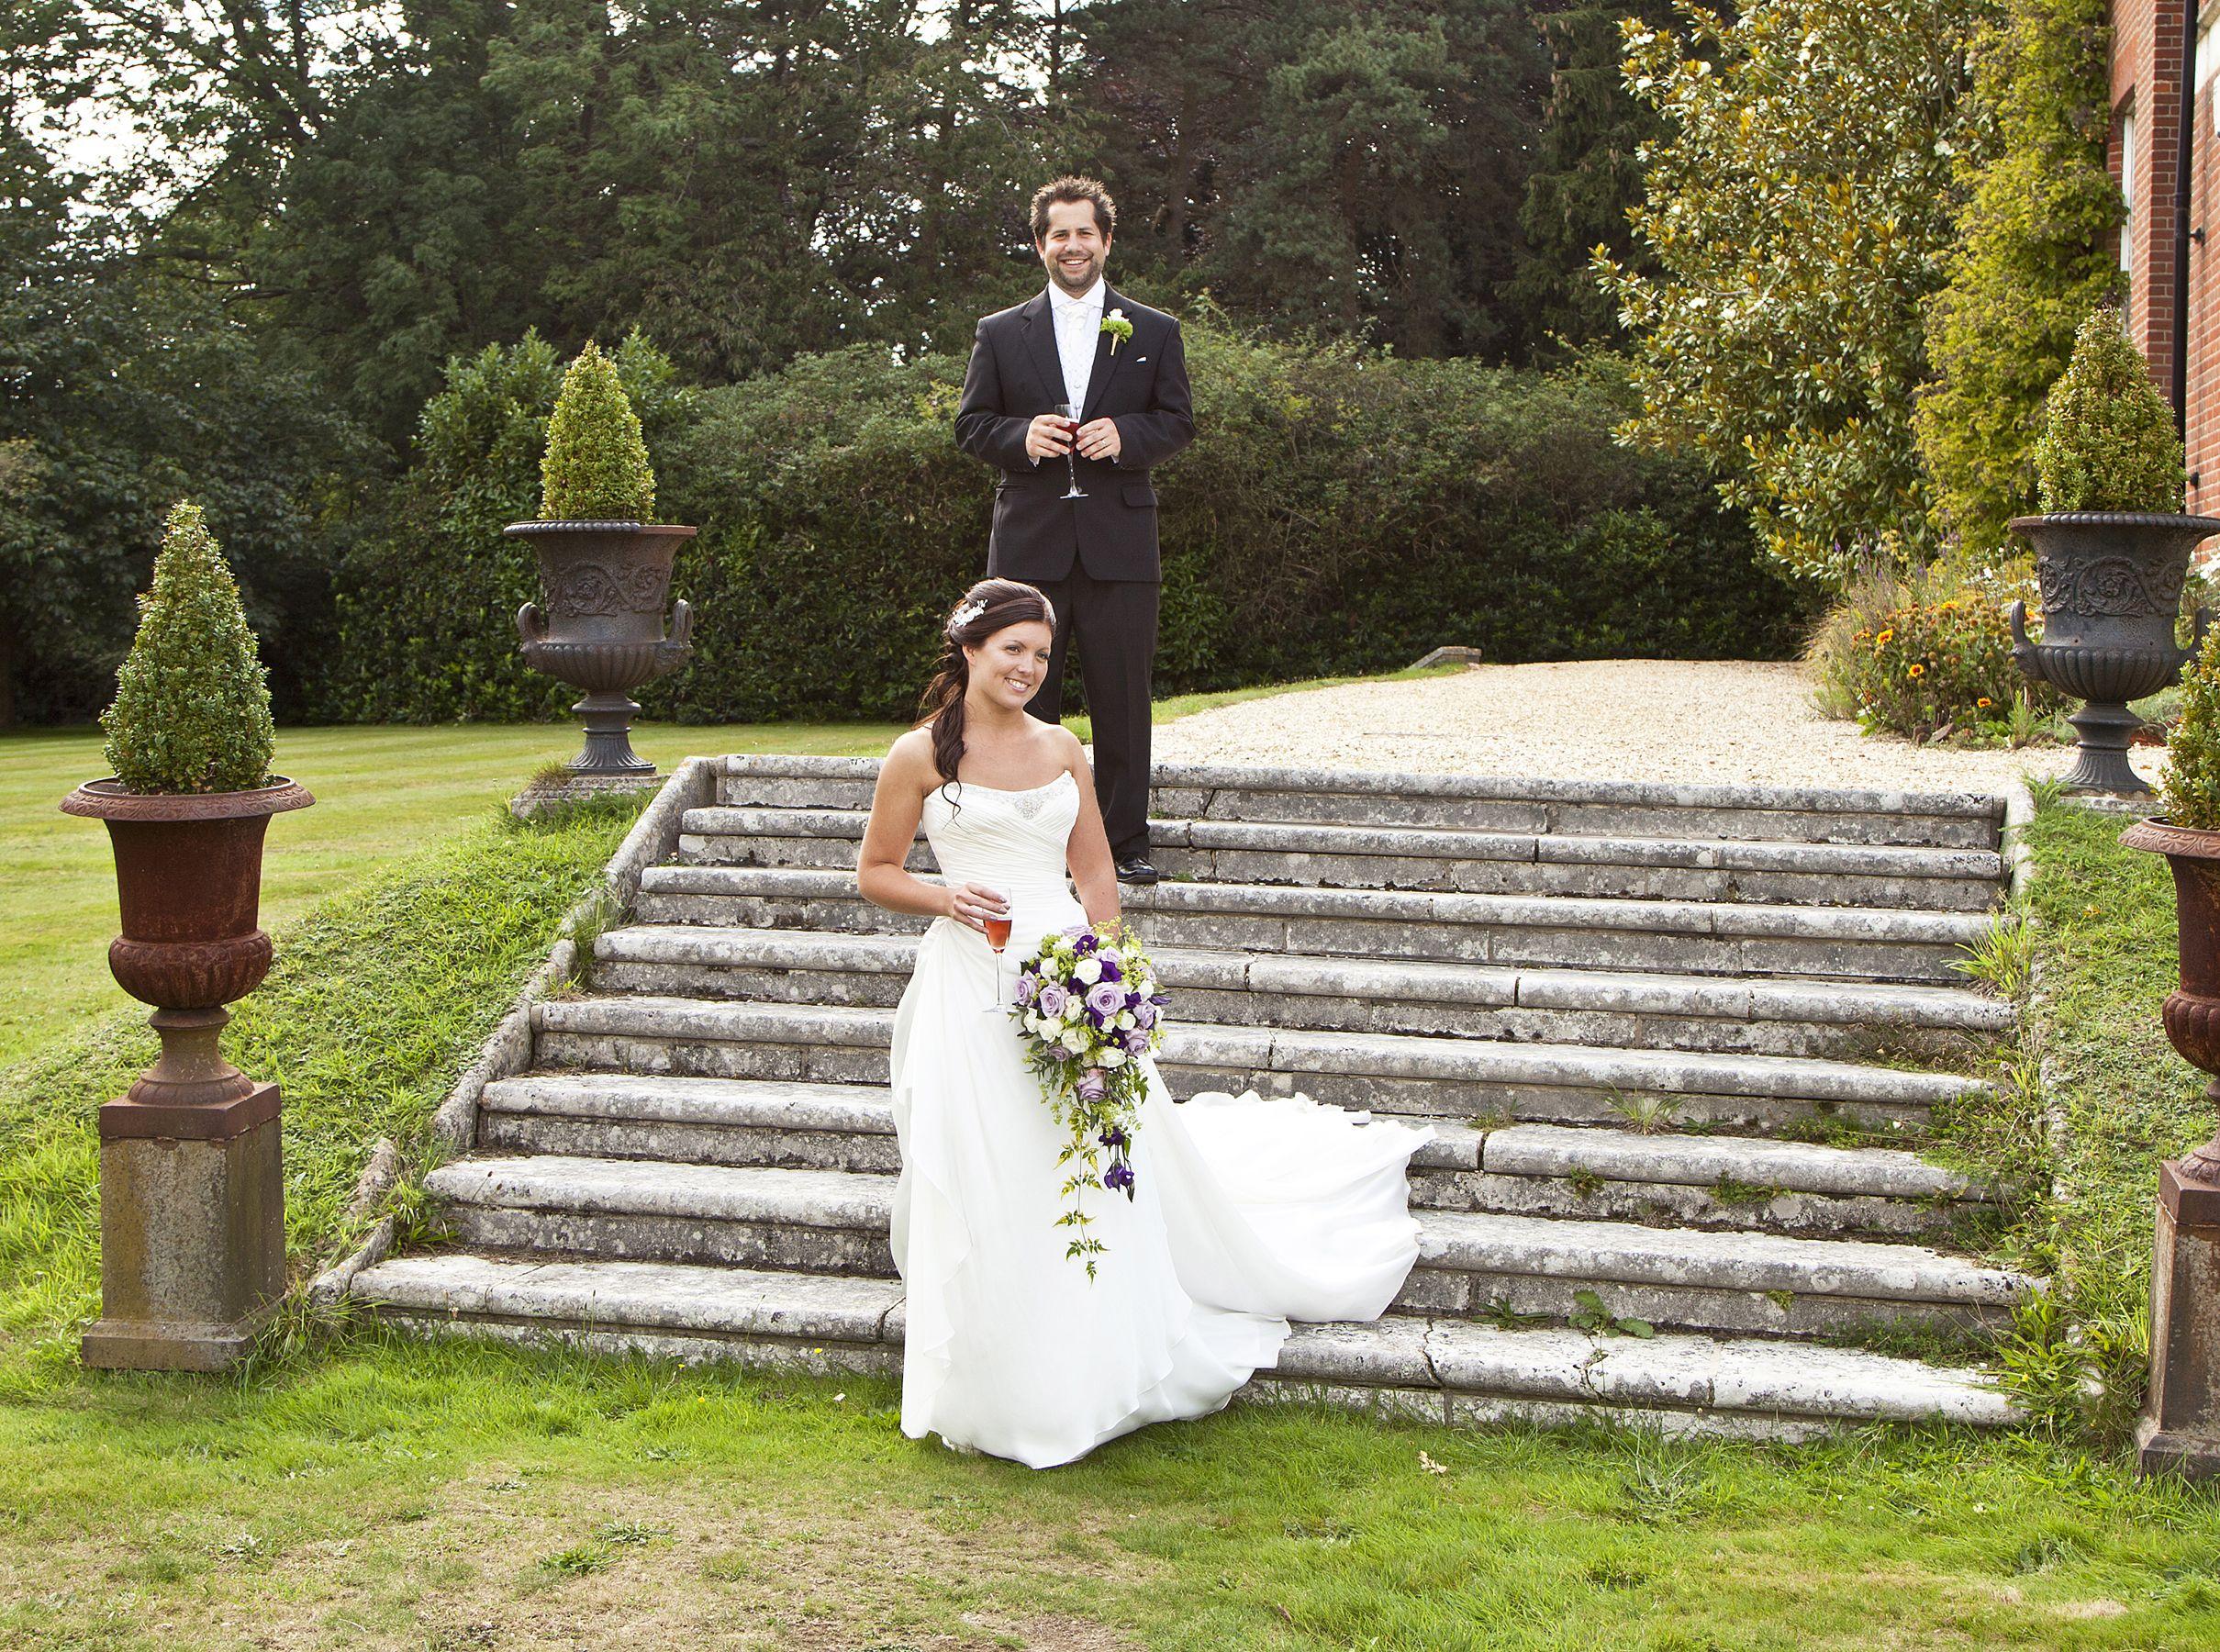 Rownhams house weddings pictures